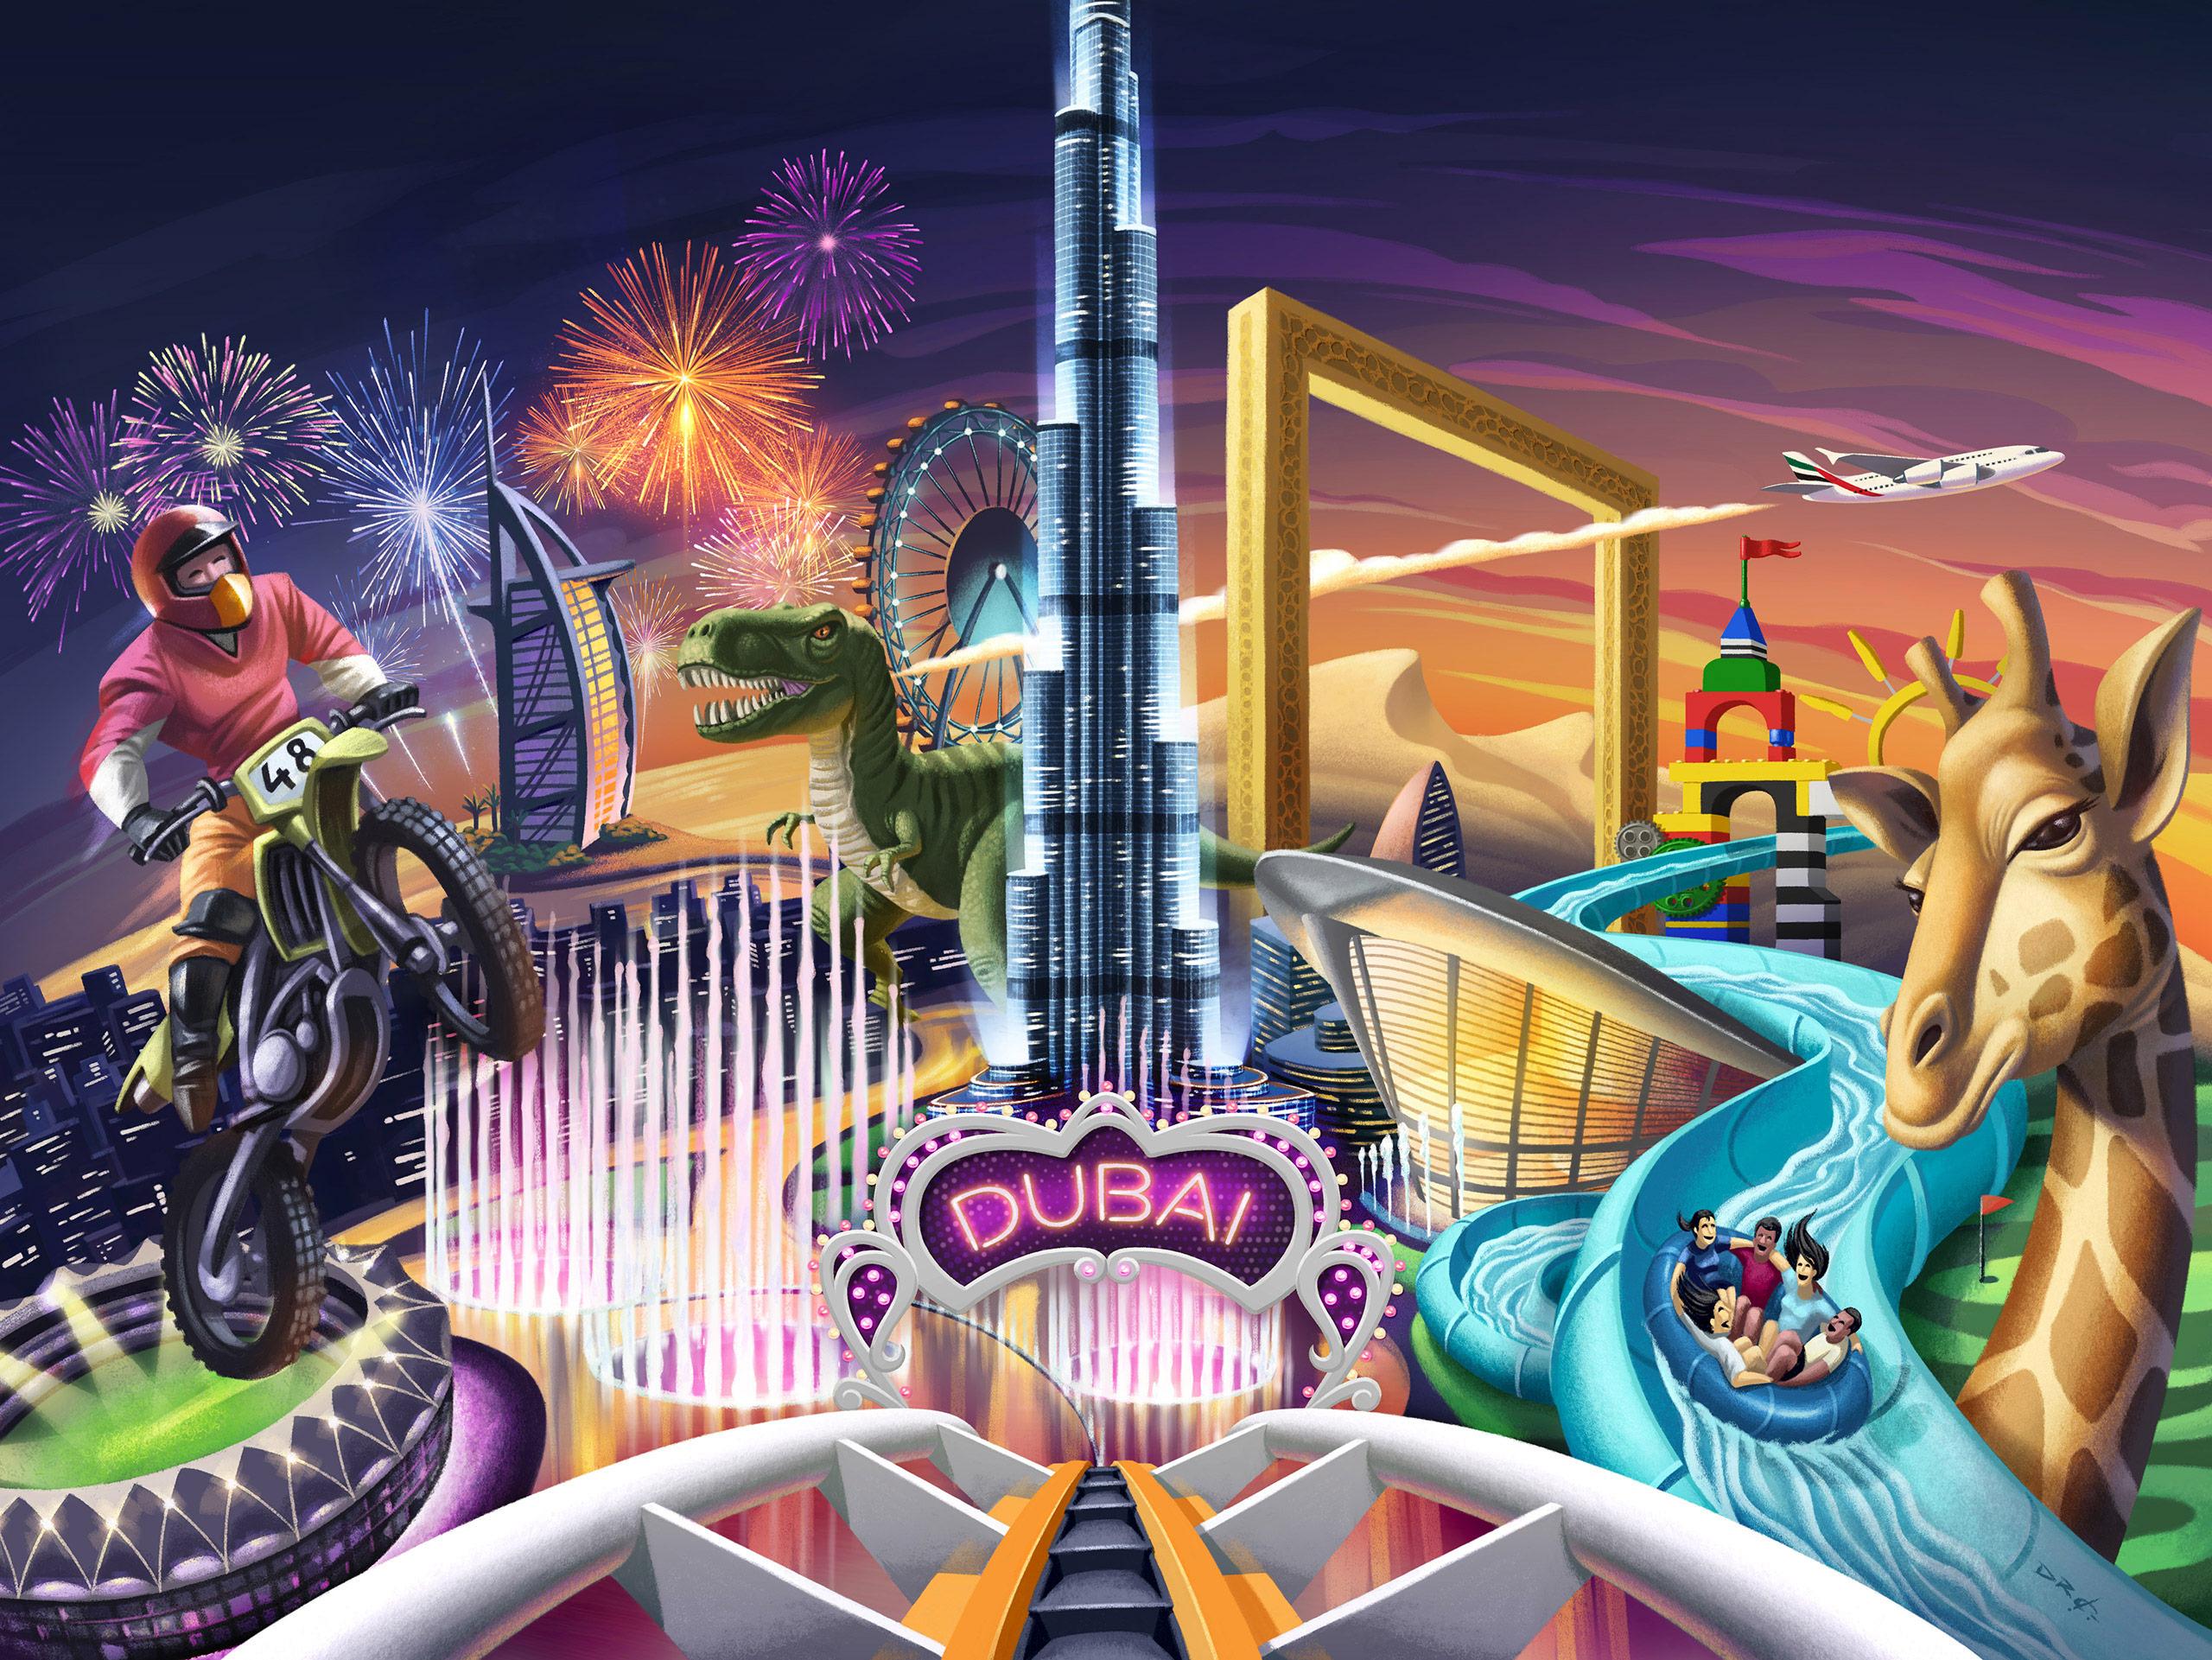 www.davidderamon.com - illustration - invest Dubai